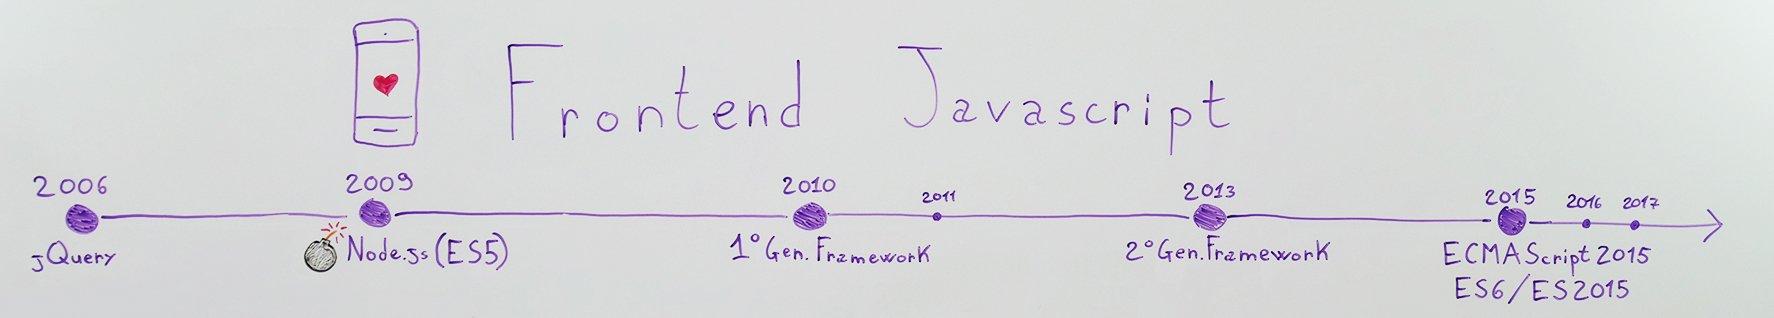 javascript-jquery-nodejs-es5-framework-prima-generazione-seconda-ecmascript-es6-es2015-es7-es2016-es8-es2017